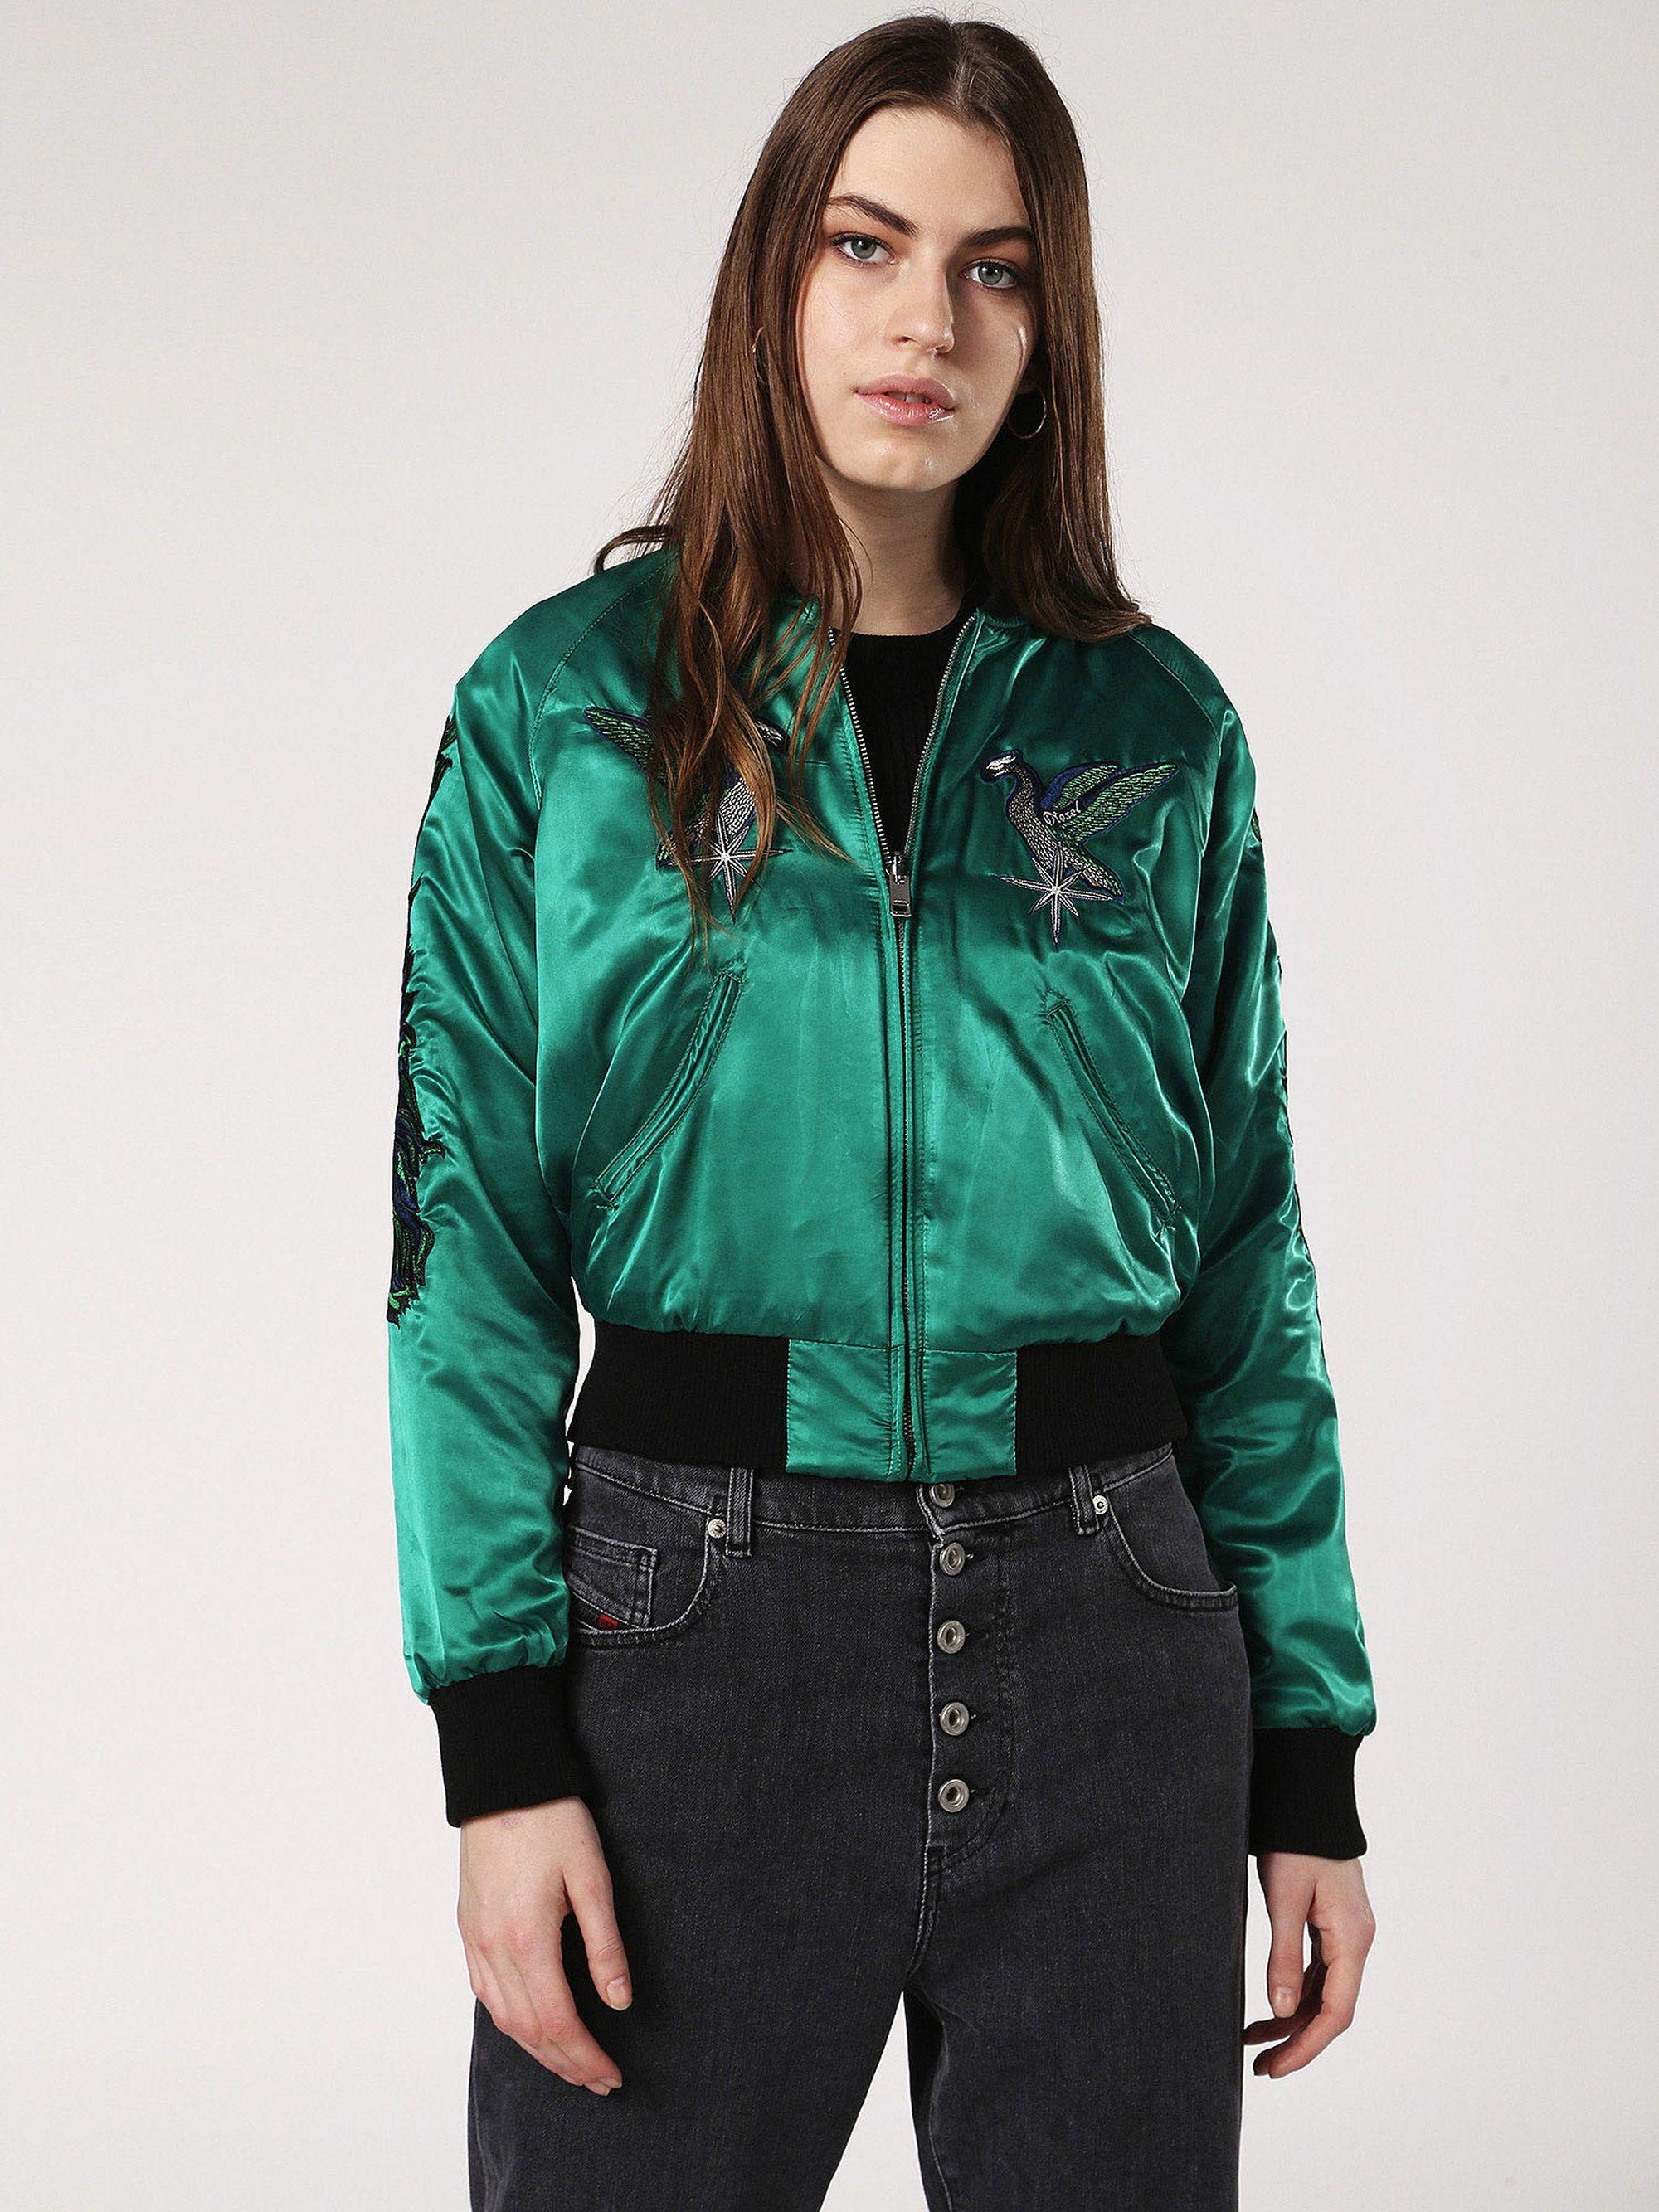 G Absol M Jacket Woman Diesel Online Store Coats For Women Diesel Jacket Coats Jackets Women [ 2667 x 2000 Pixel ]